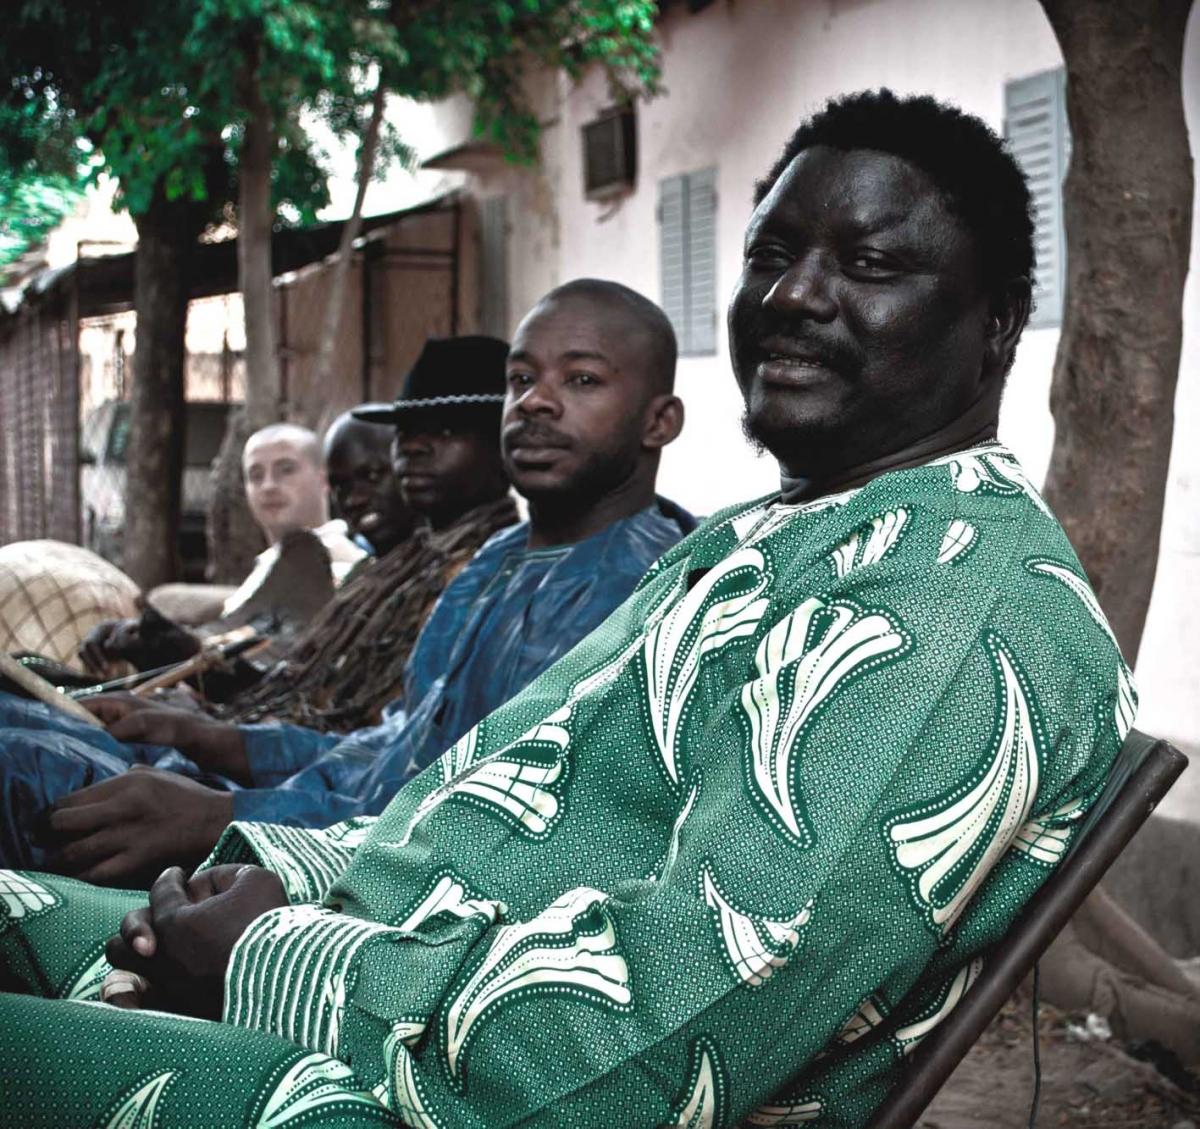 Ecoutes Au Vert / Genève / Aventures sonores au grand air! / BKO QUINTET (Bamako, Mali) - MUSIC Videos / 1618595368